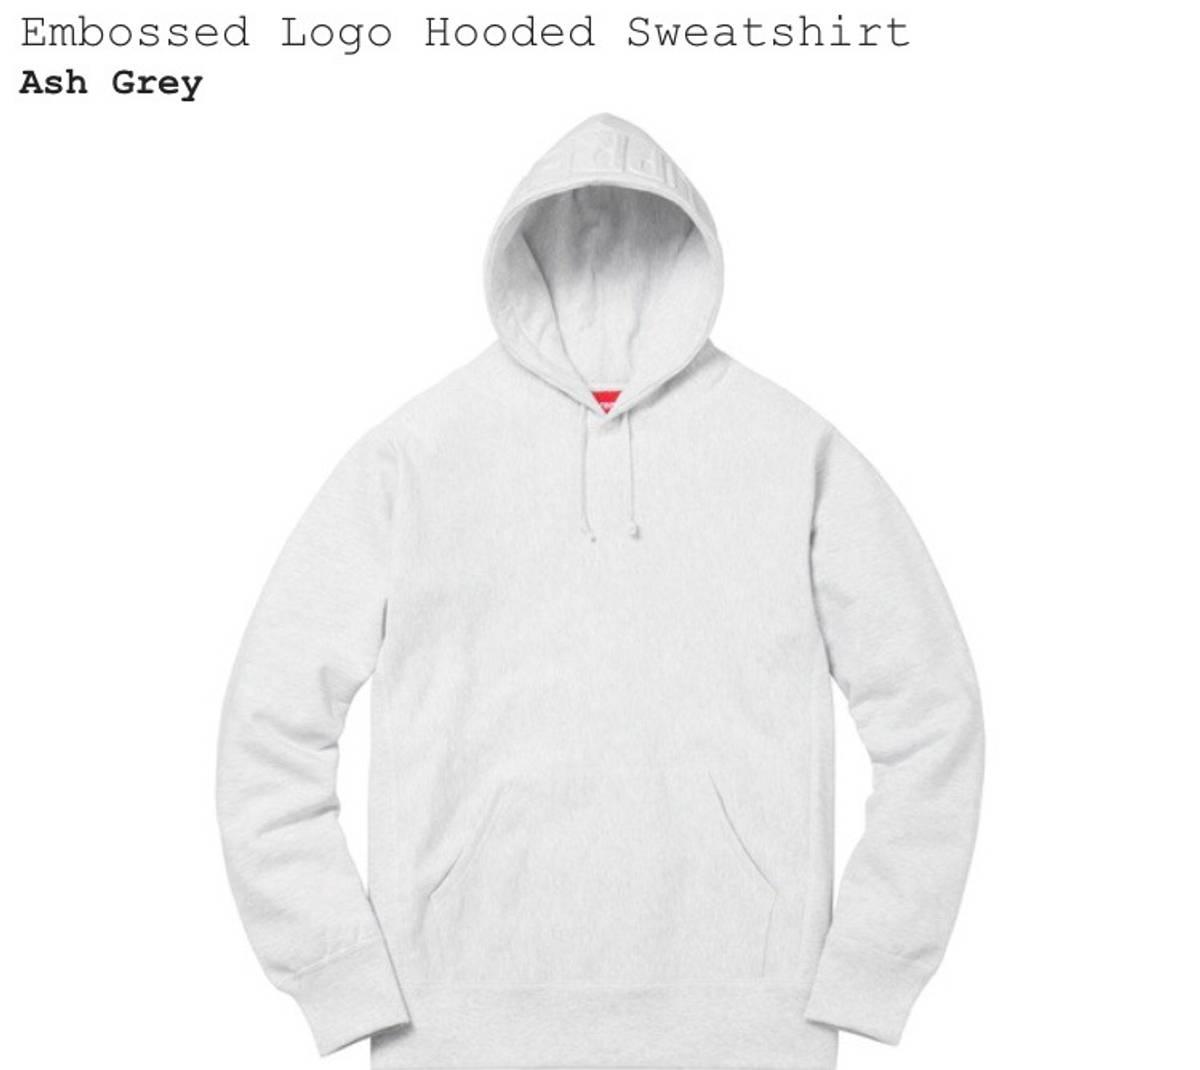 762f0986125a0 Supreme Embossed Logo Hooded Sweatshirt Size xl - Sweatshirts   Hoodies for  Sale - Grailed